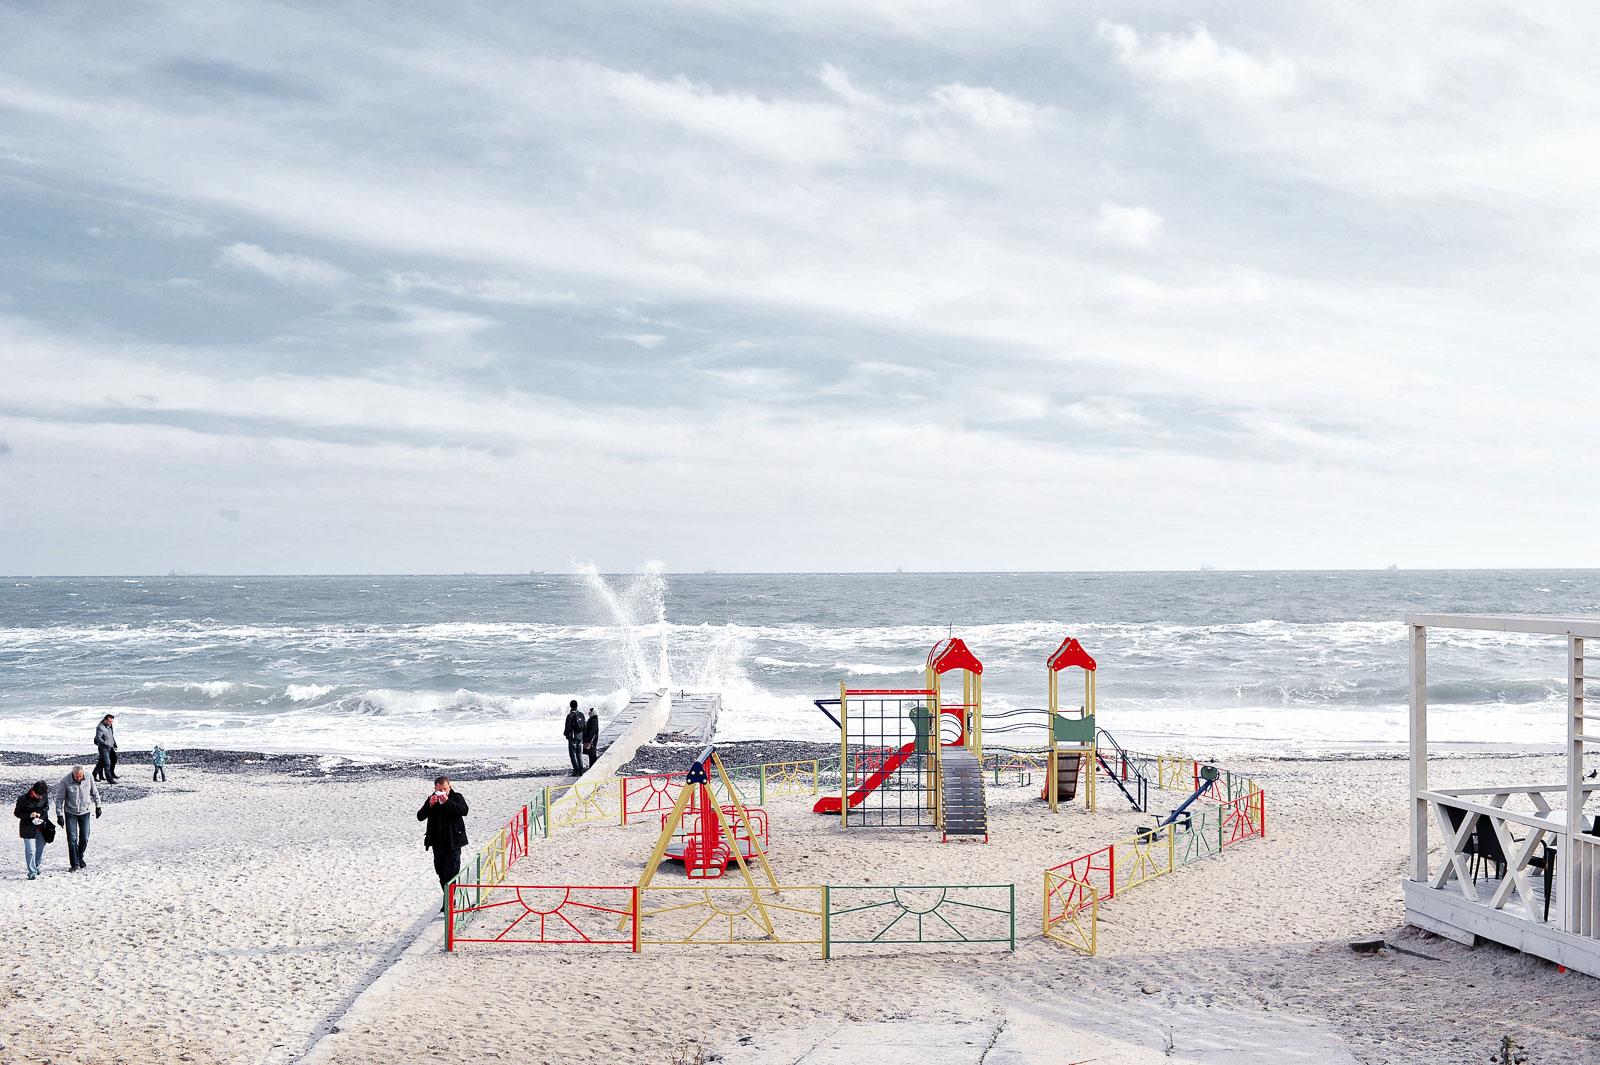 Playful playground